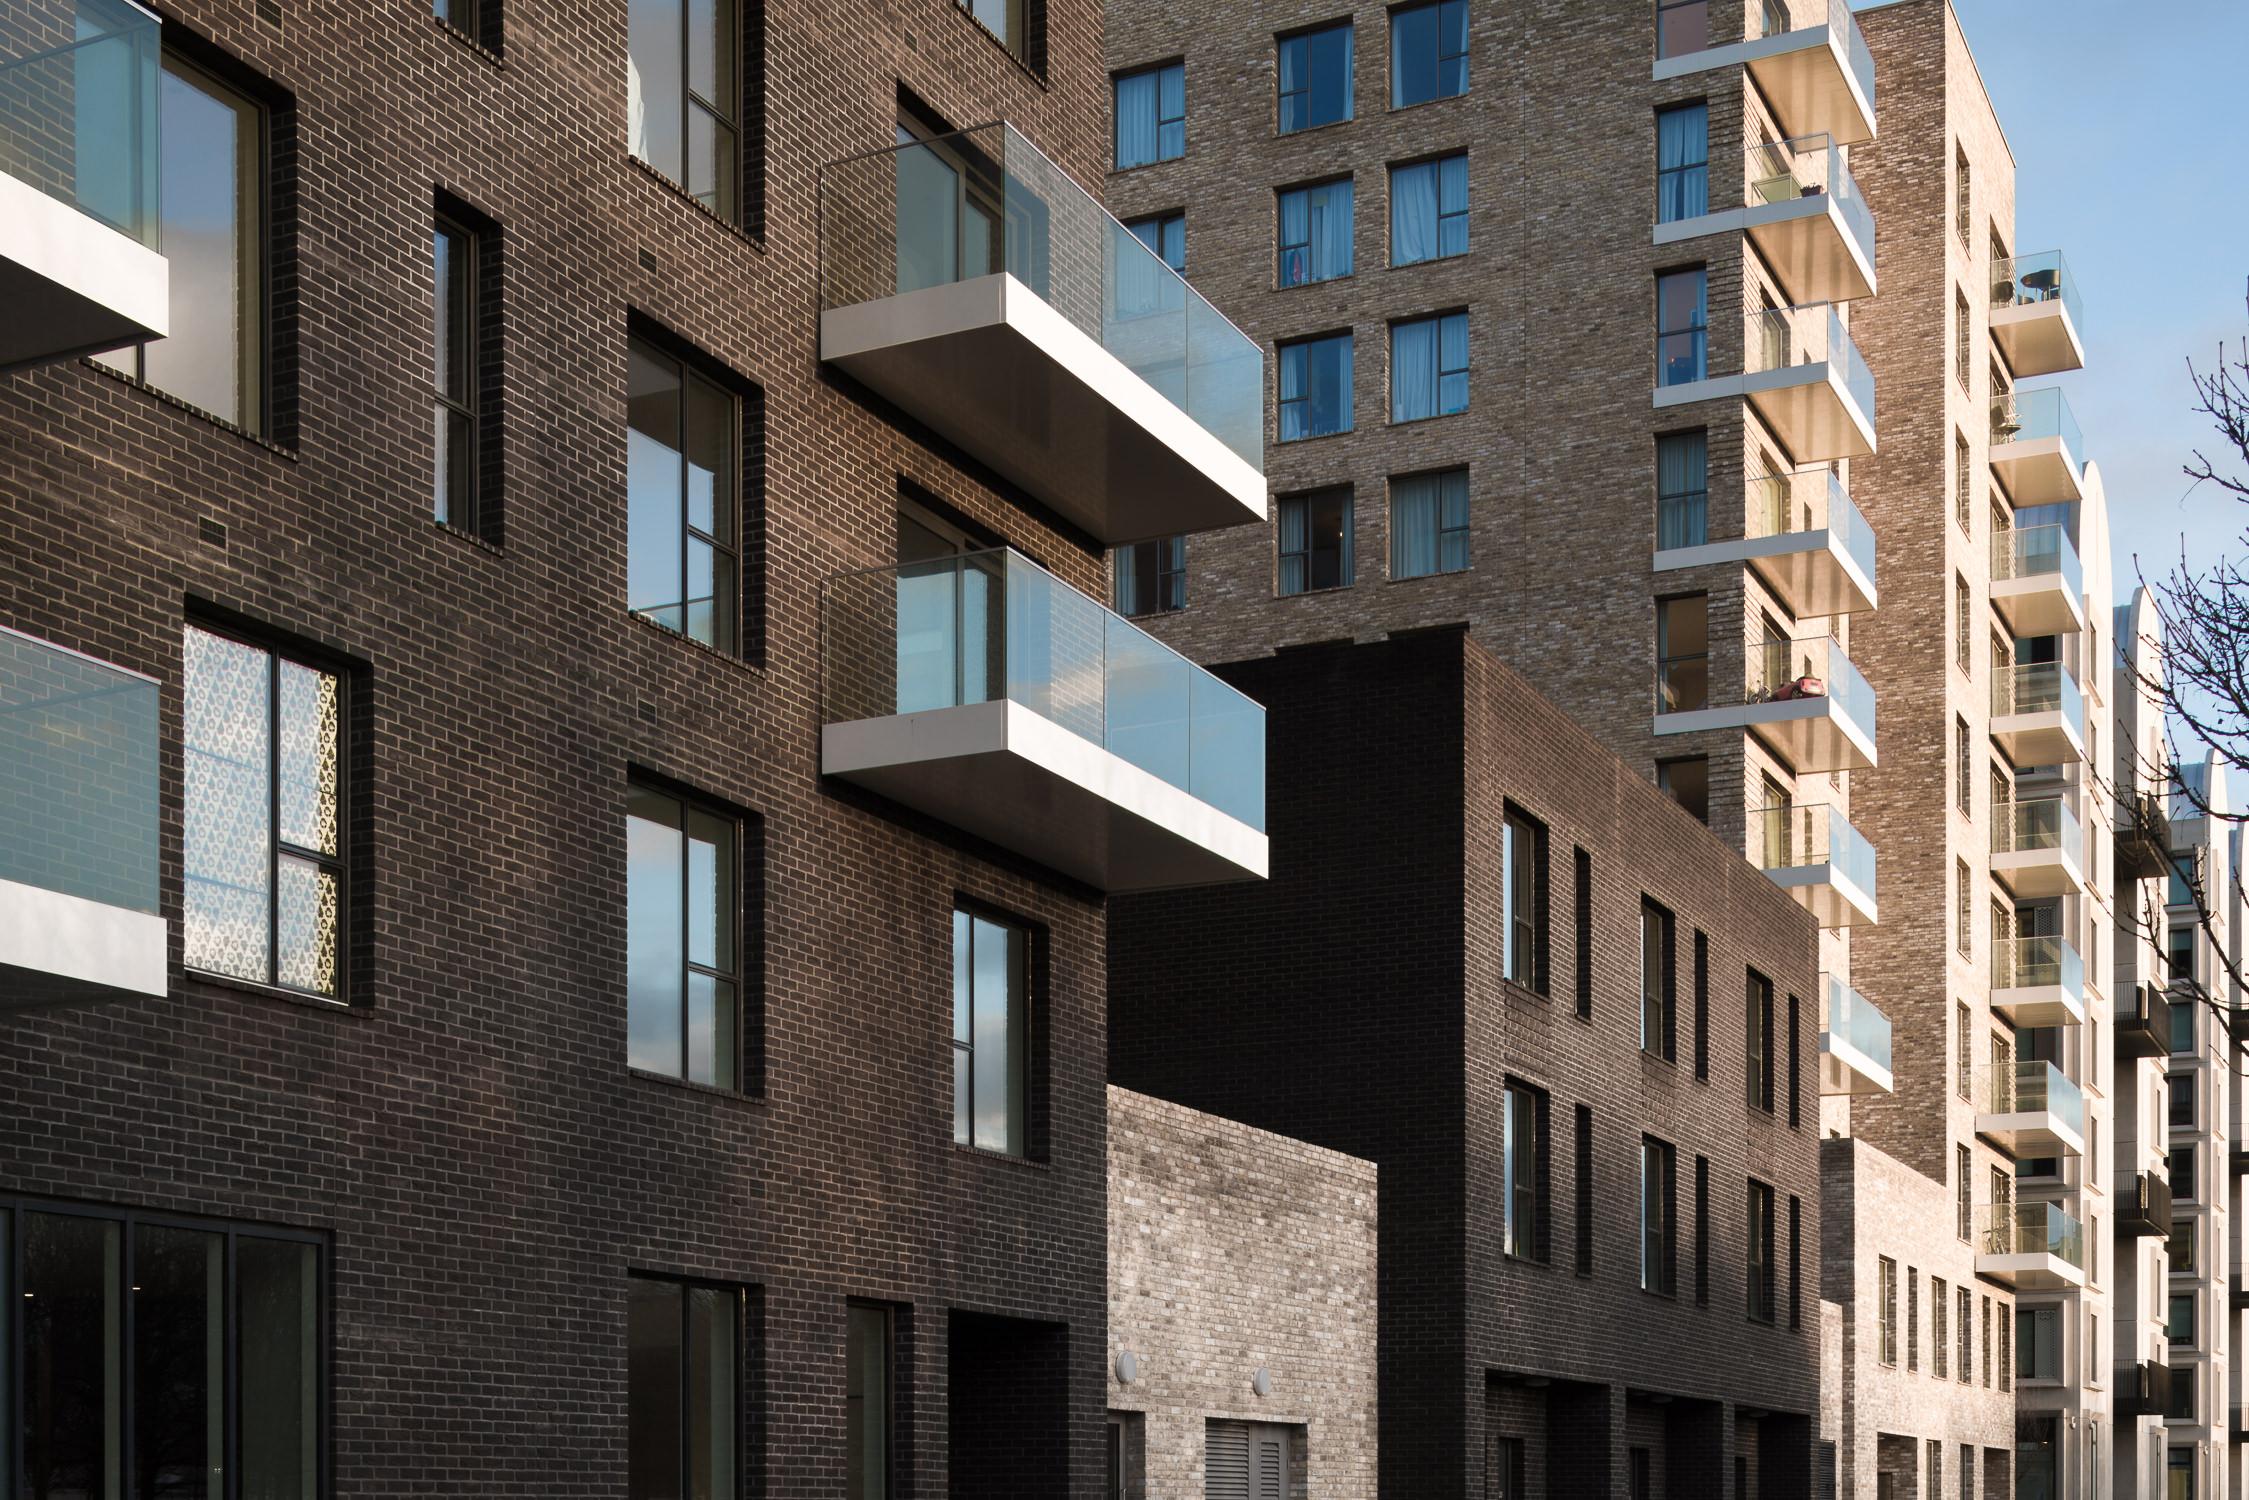 mark-hadden-architecture-photographer-architectuur-interieur-fotografie-london-amsterdam-GreenwichPeninsula-439.jpg